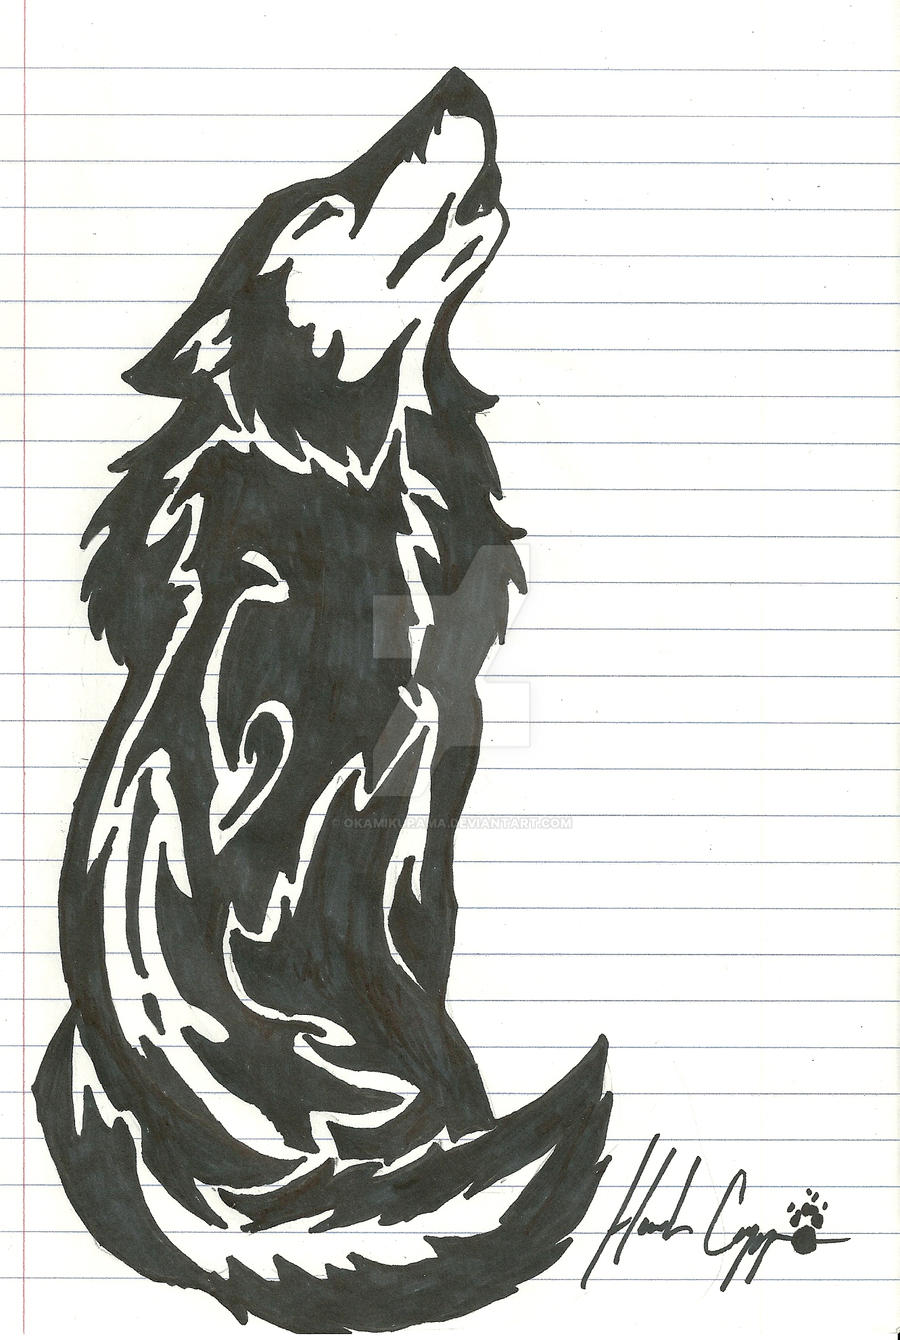 Howling Wolf Tribal Tattoo by Okamikurama on DeviantArt